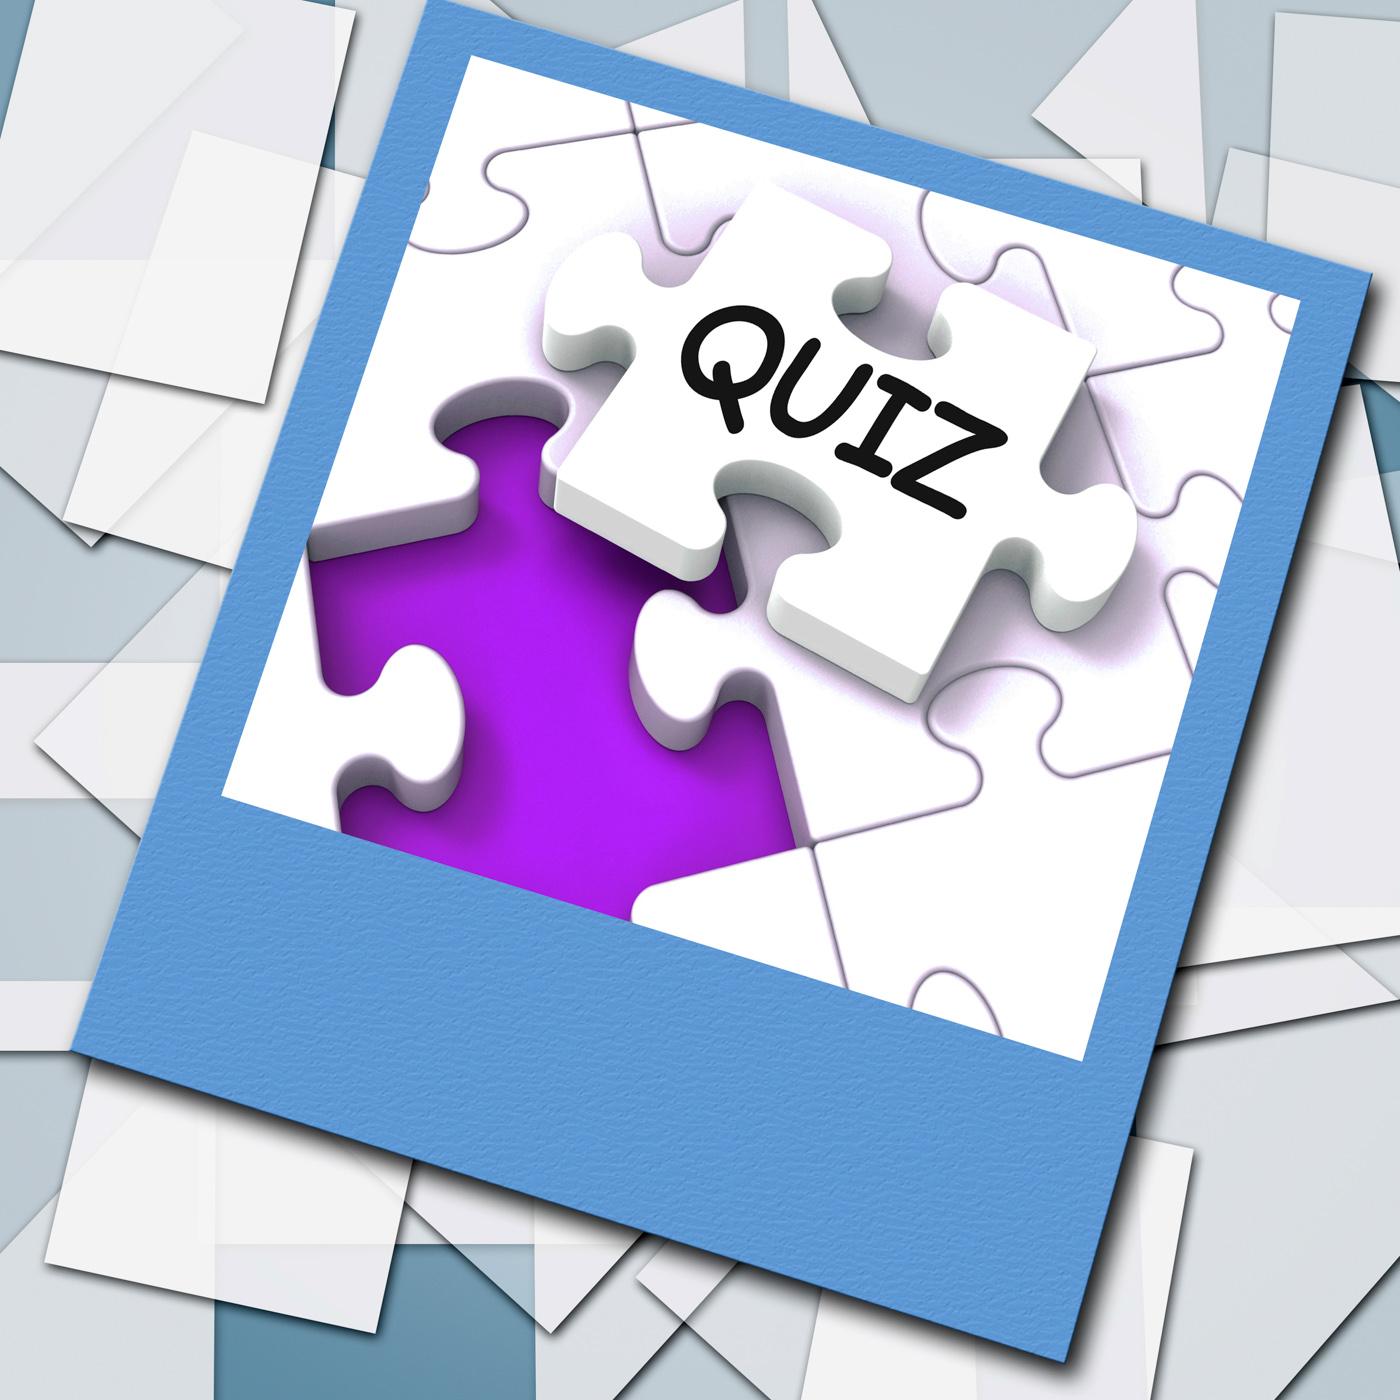 Quiz Photo Means Online Exam Or Challenge Questions, Answer, Answers, Challenge, Exam, HQ Photo